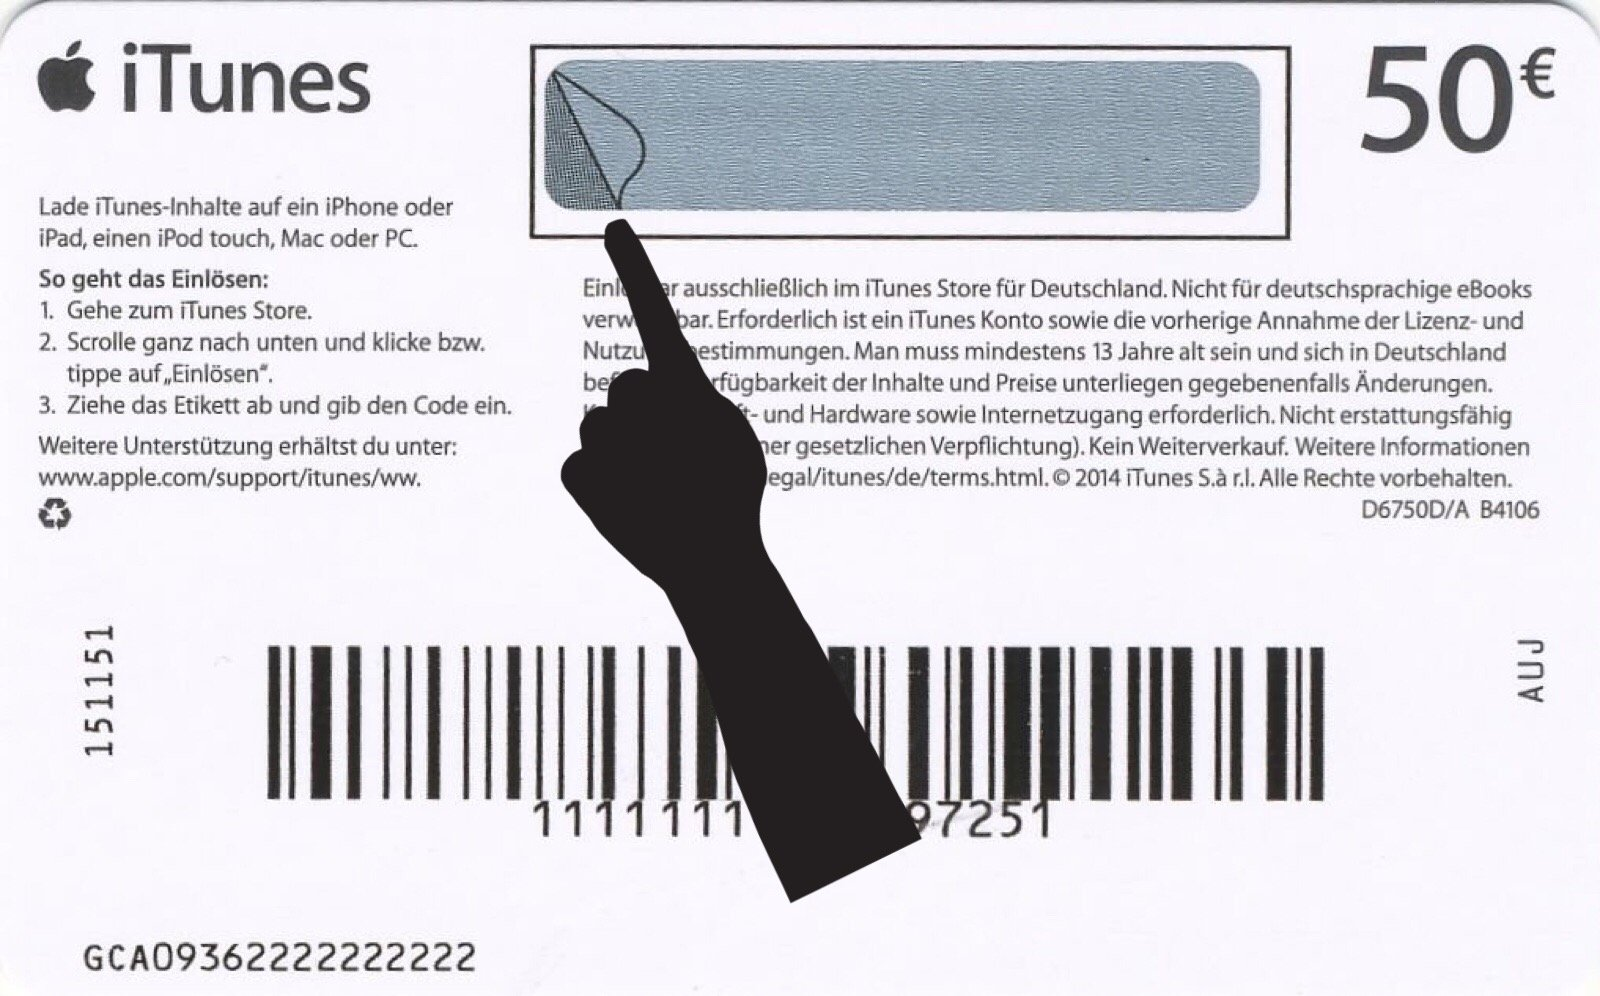 wo paypal karte kaufen